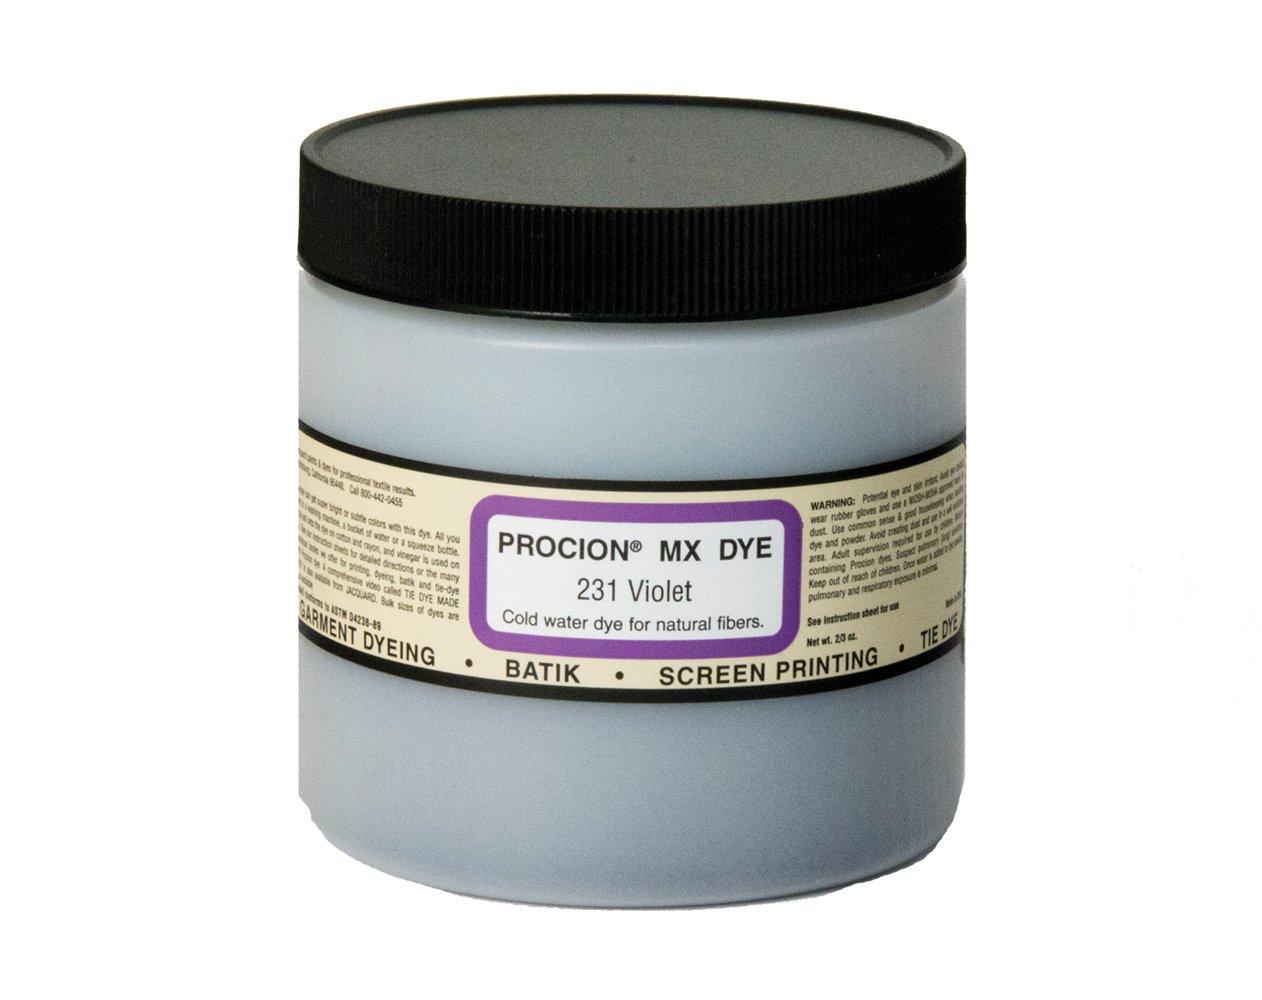 Jacquard Products Bright Vio-Jacquard Procion Dye, Acrylic, Multicolour